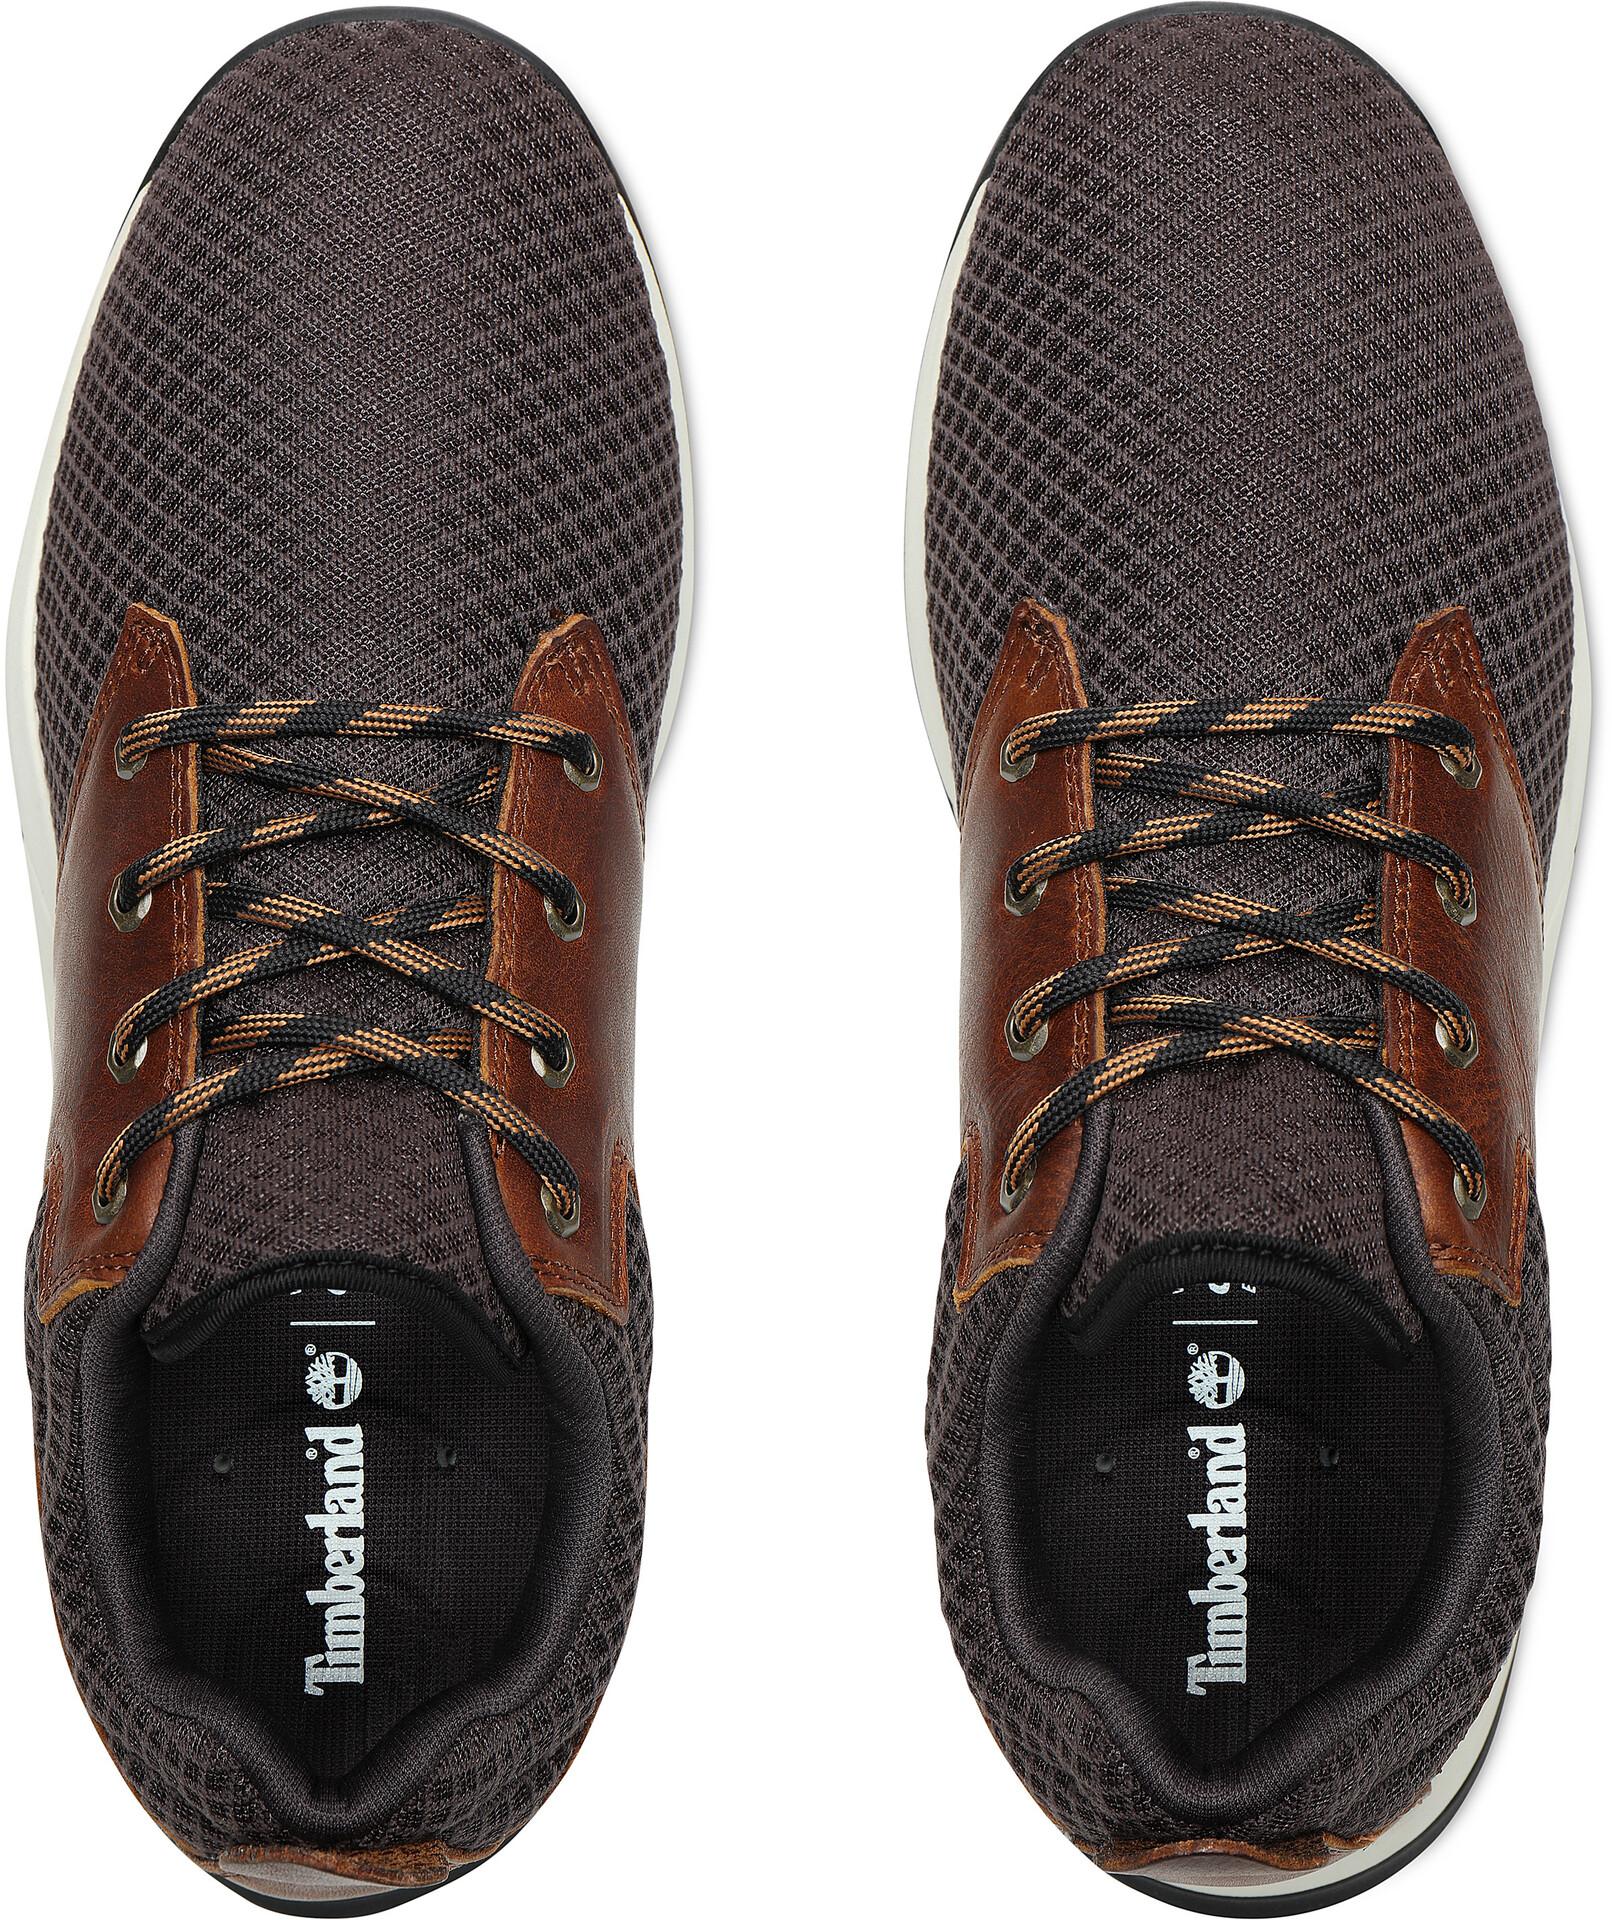 Tige À Black Chaussures Timberland HommeJet Tuckerman Basse FKTcl1J